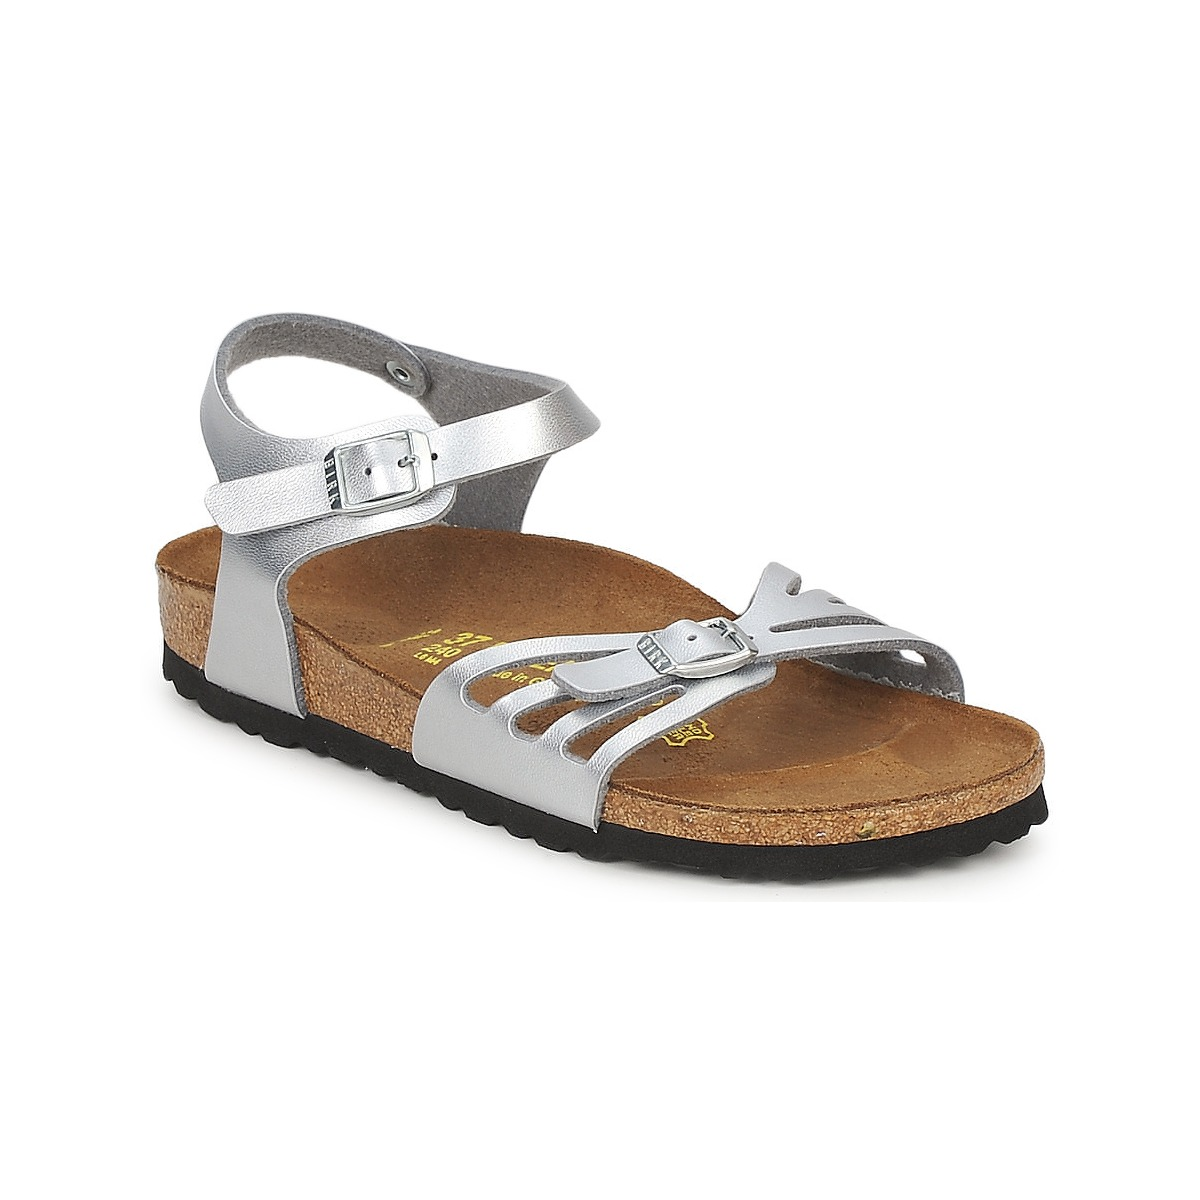 sandale birkenstock bali argent livraison gratuite avec chaussures femme 77 99. Black Bedroom Furniture Sets. Home Design Ideas